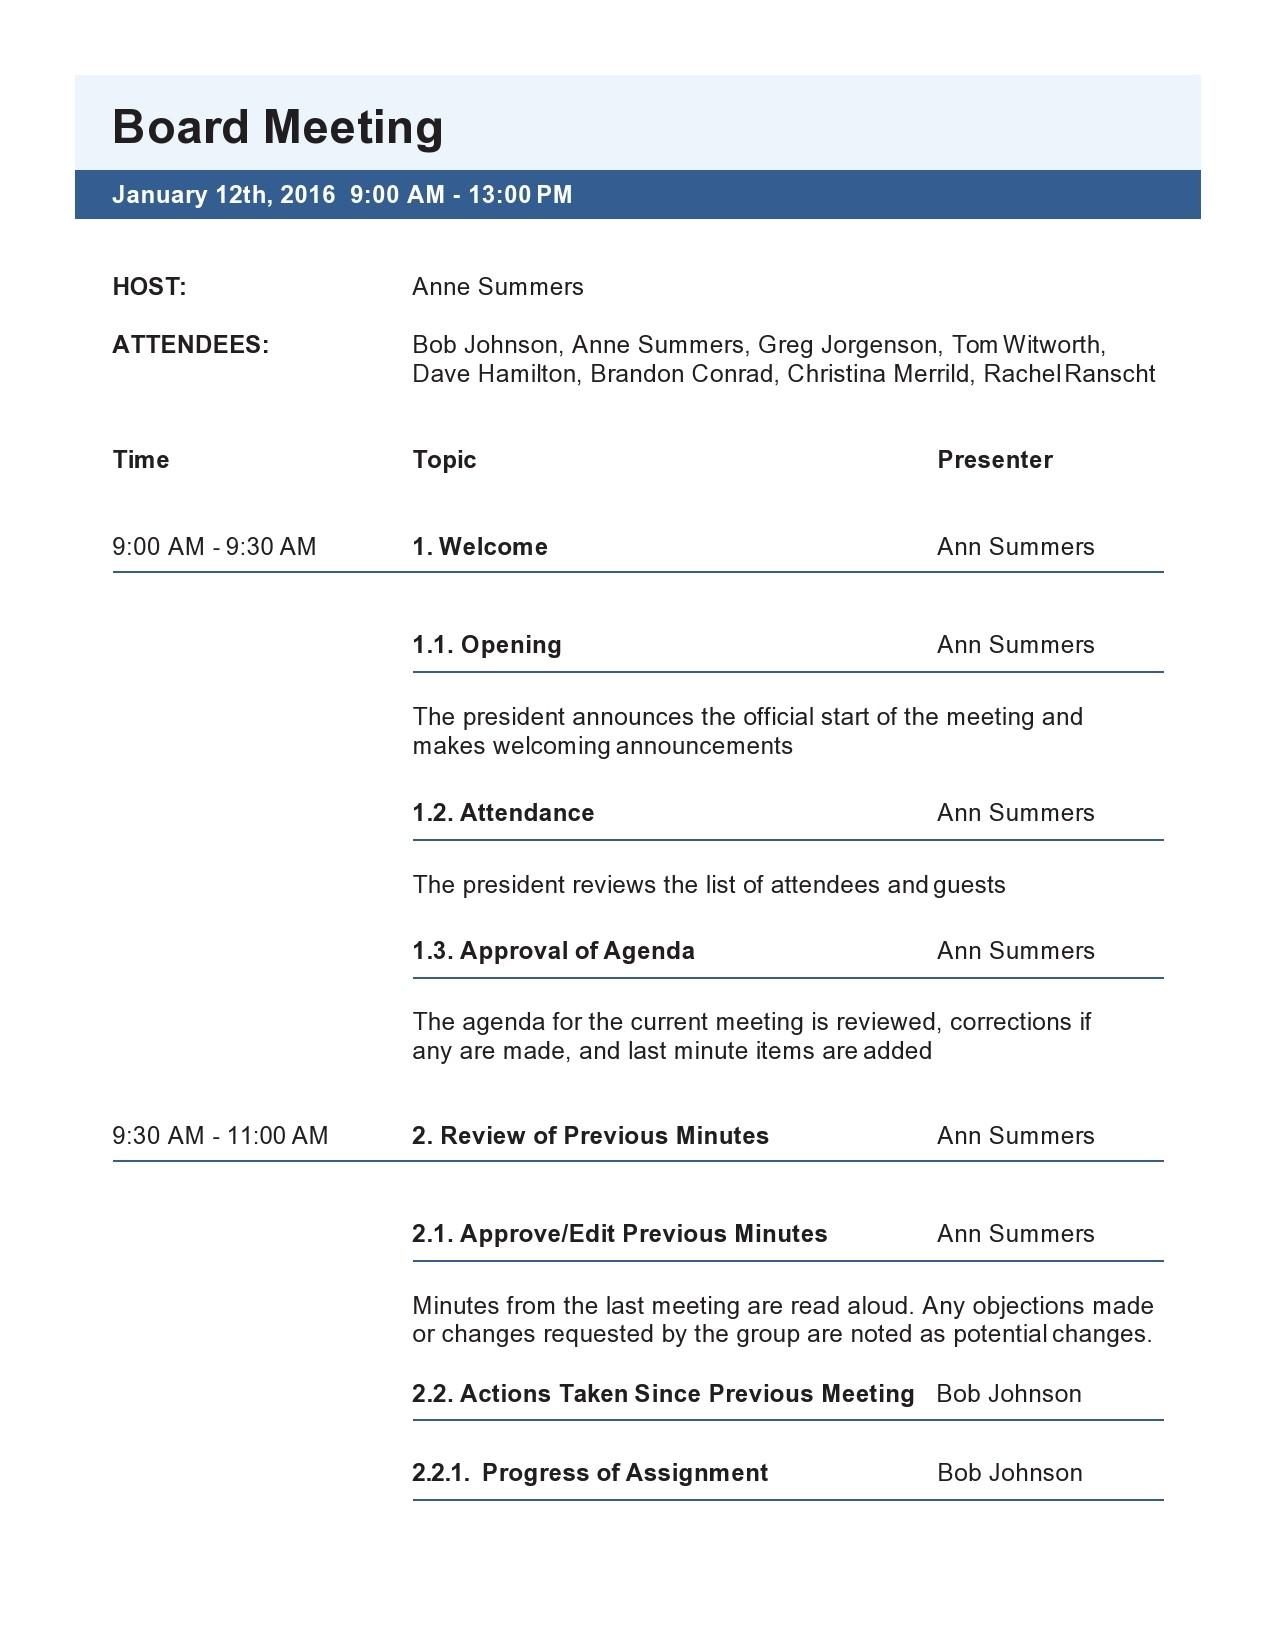 Free board meeting agenda 04